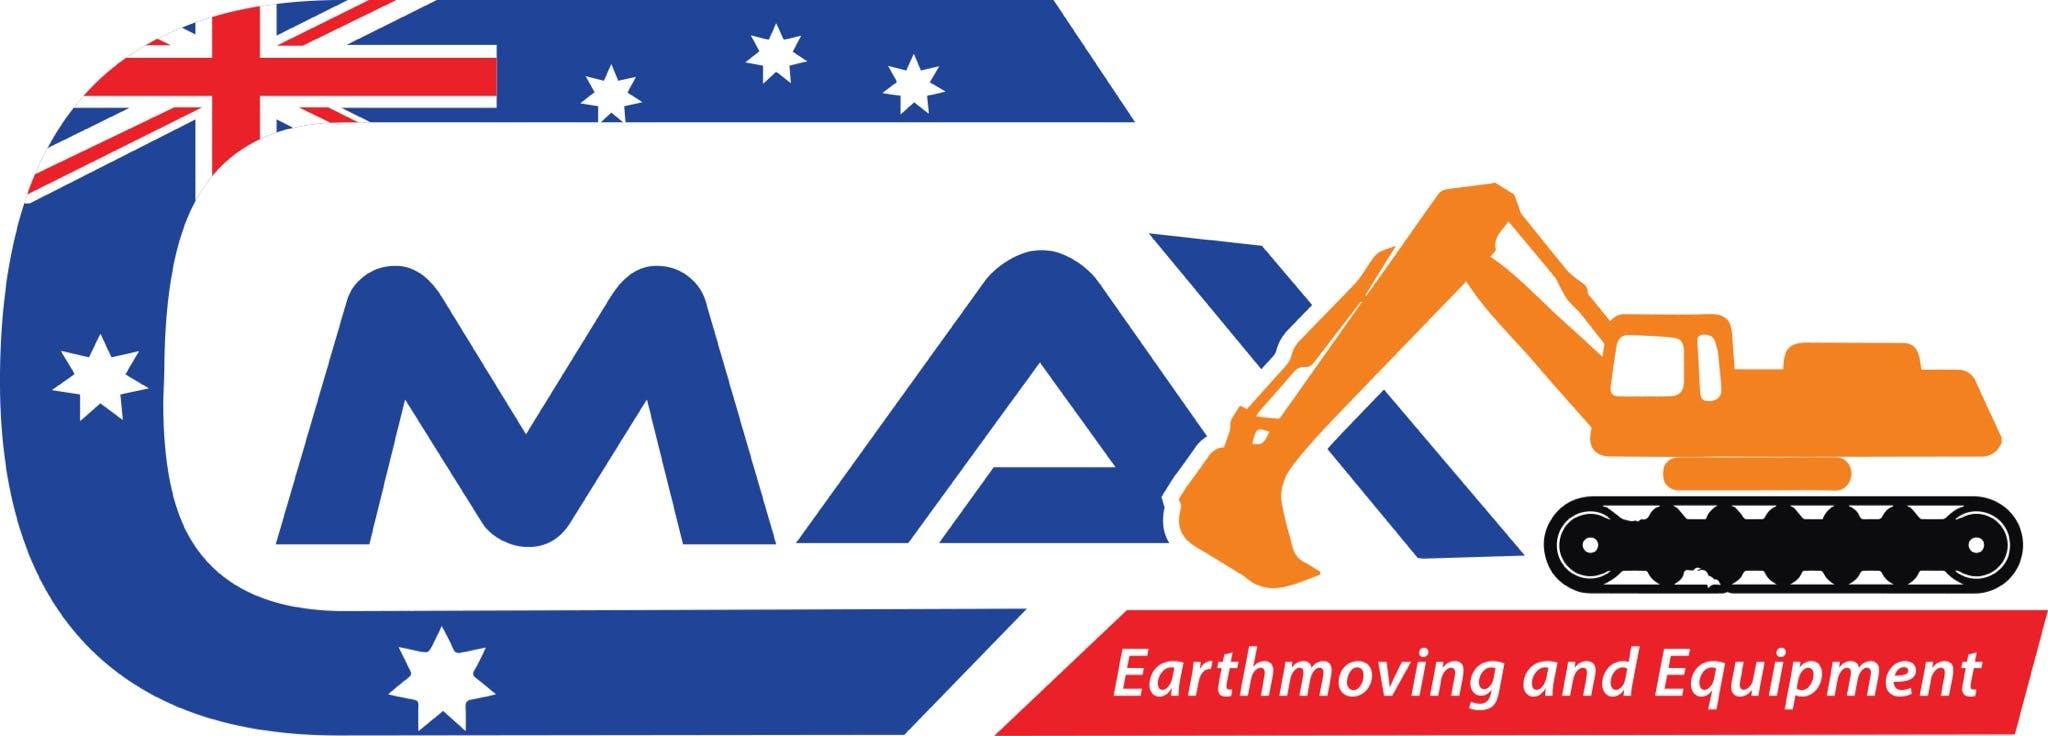 Cmax earthmoving and equipment